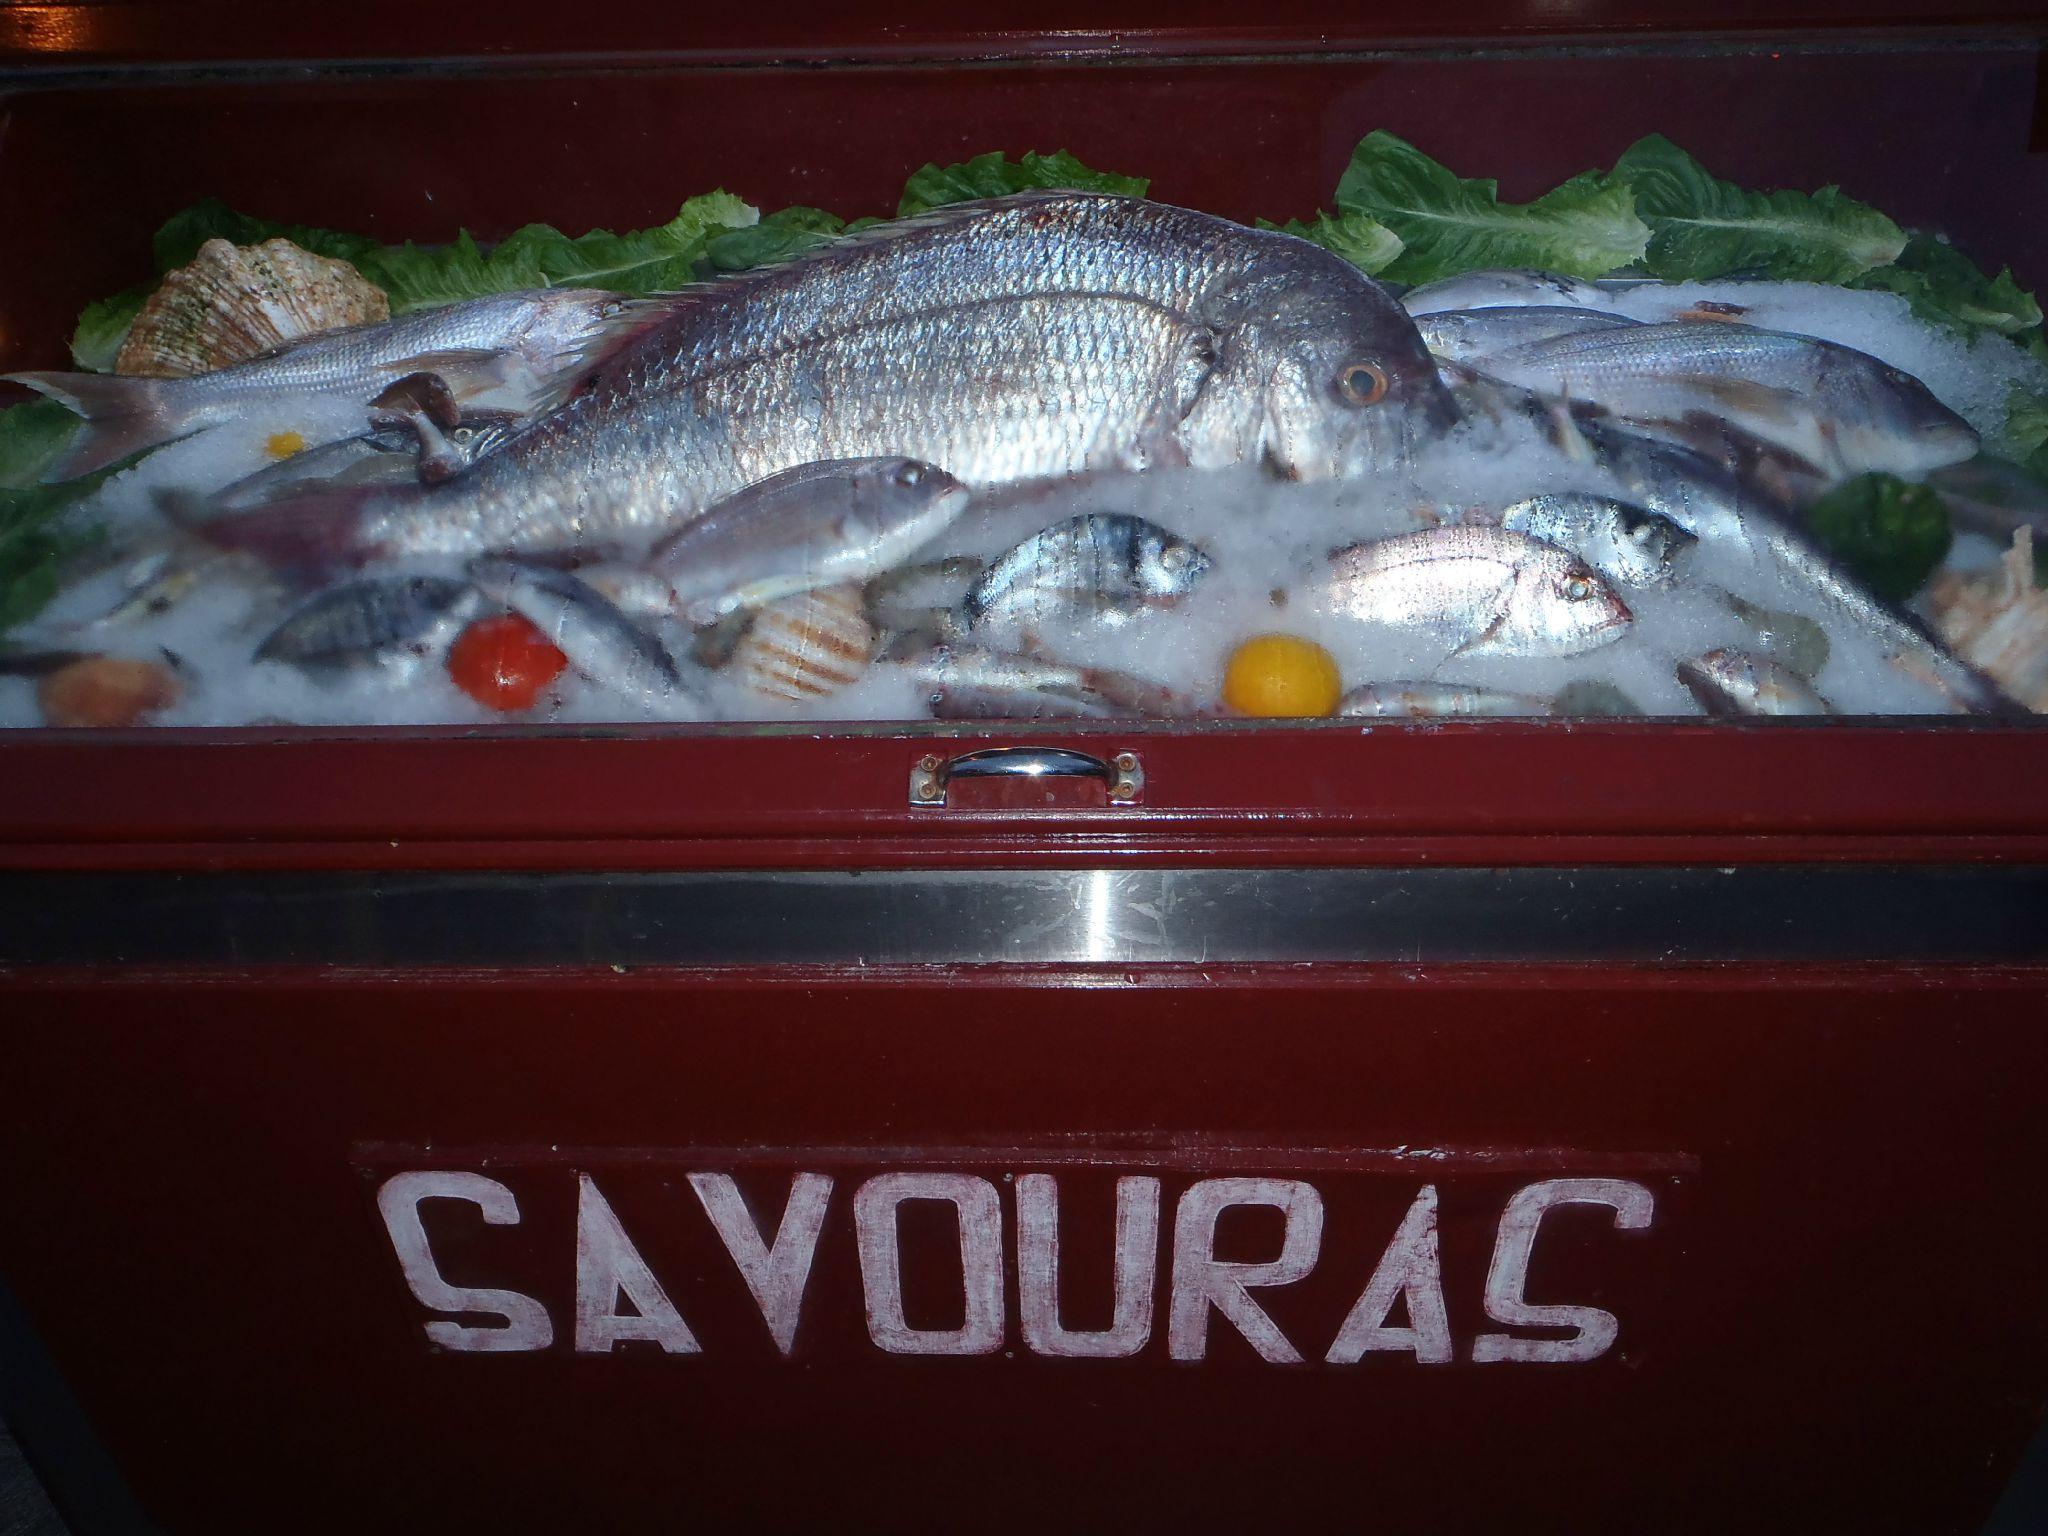 grece nauplie restaurant savoraz présentation poissons